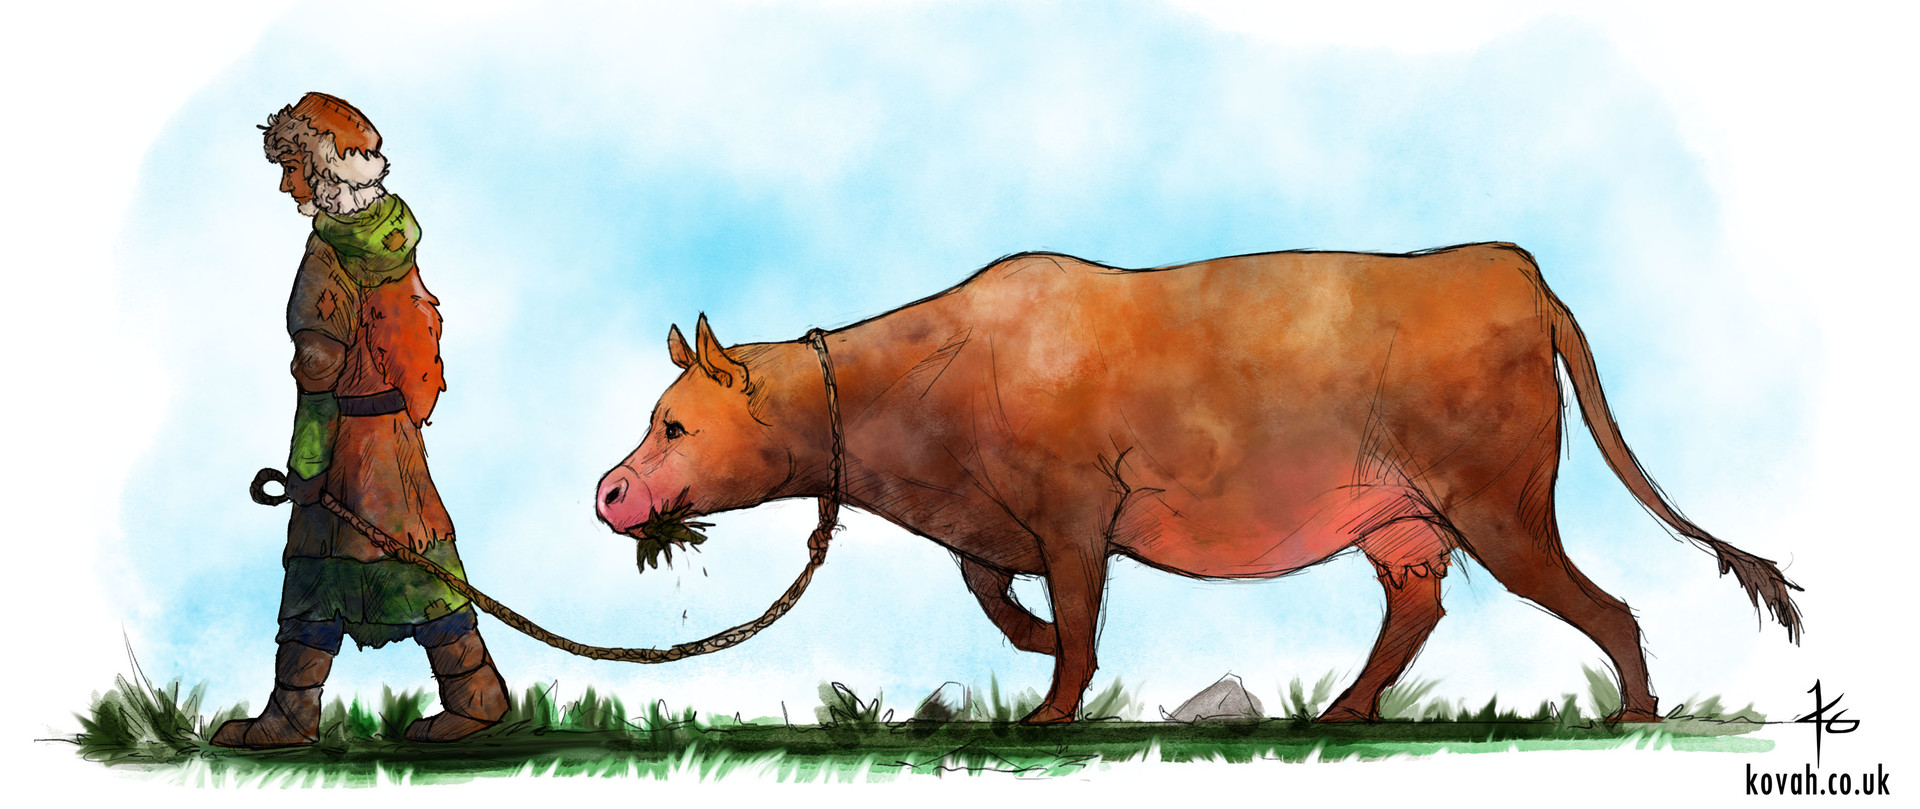 Katy grierson cow2